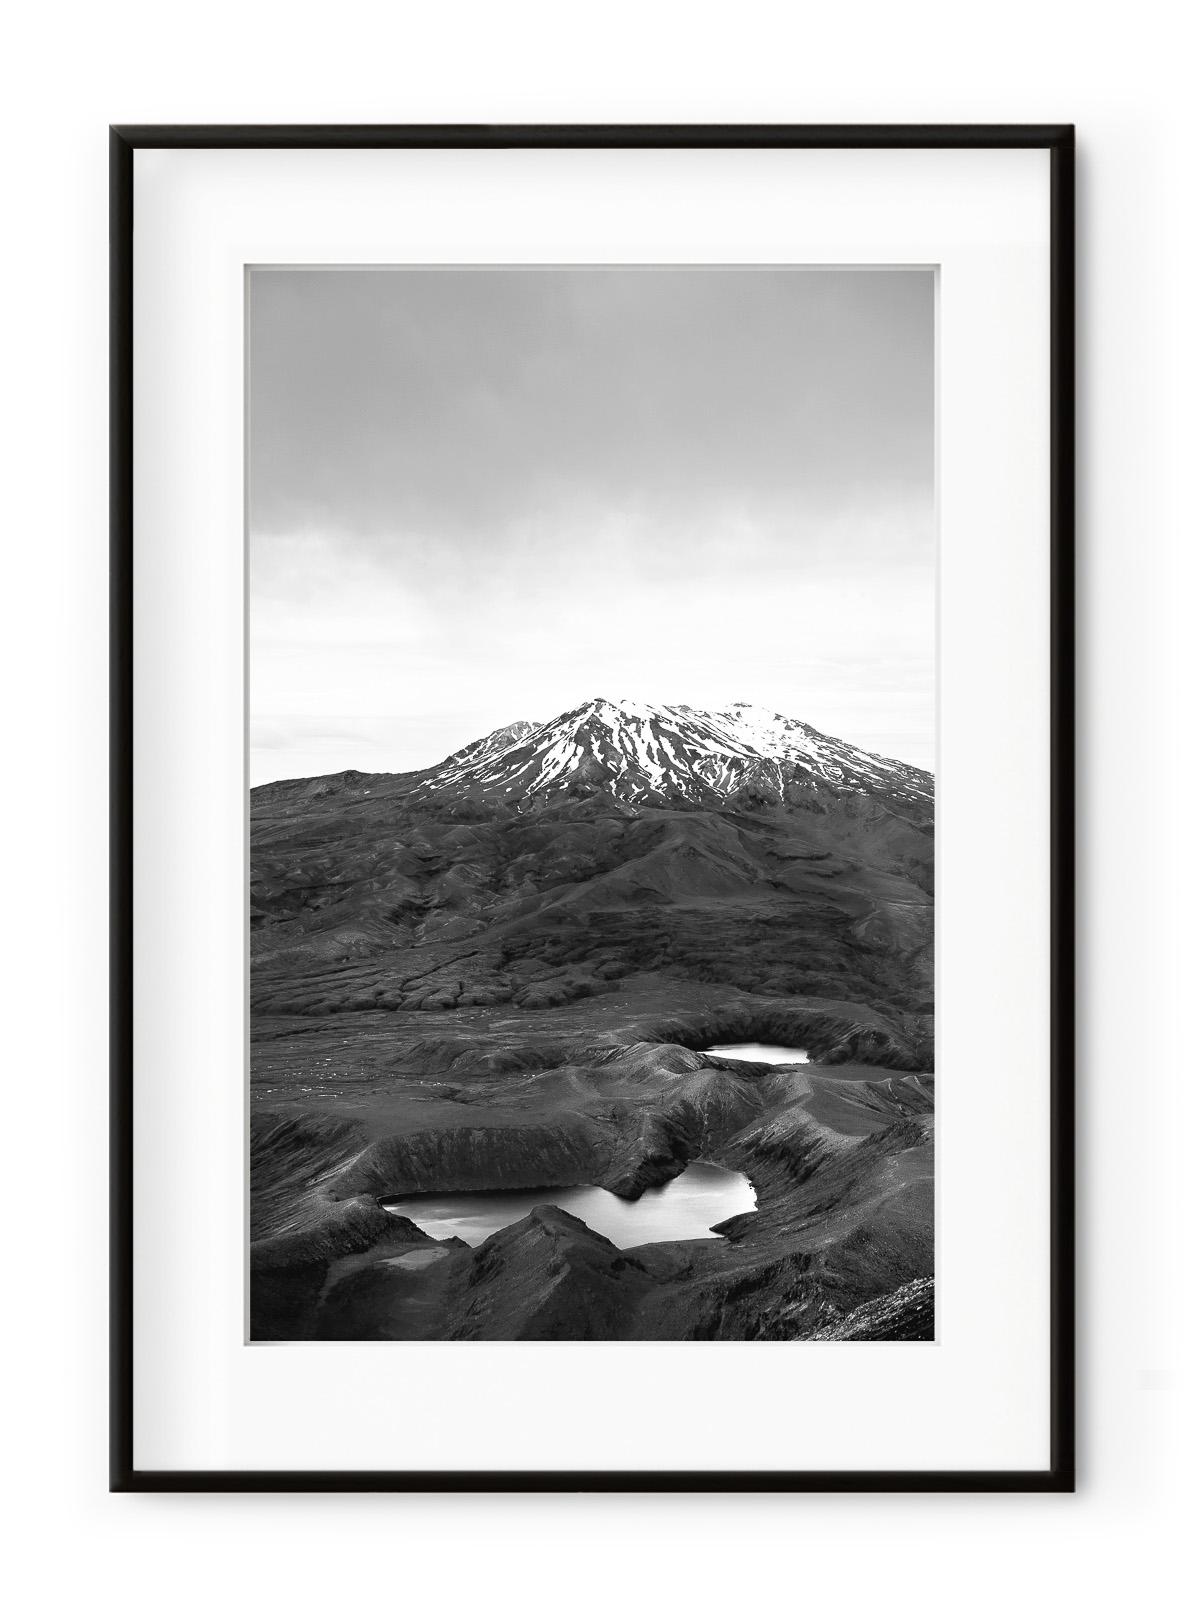 Tablou Ruapehu Stratovolcano Nouvelle Zelande Aluminium Noir